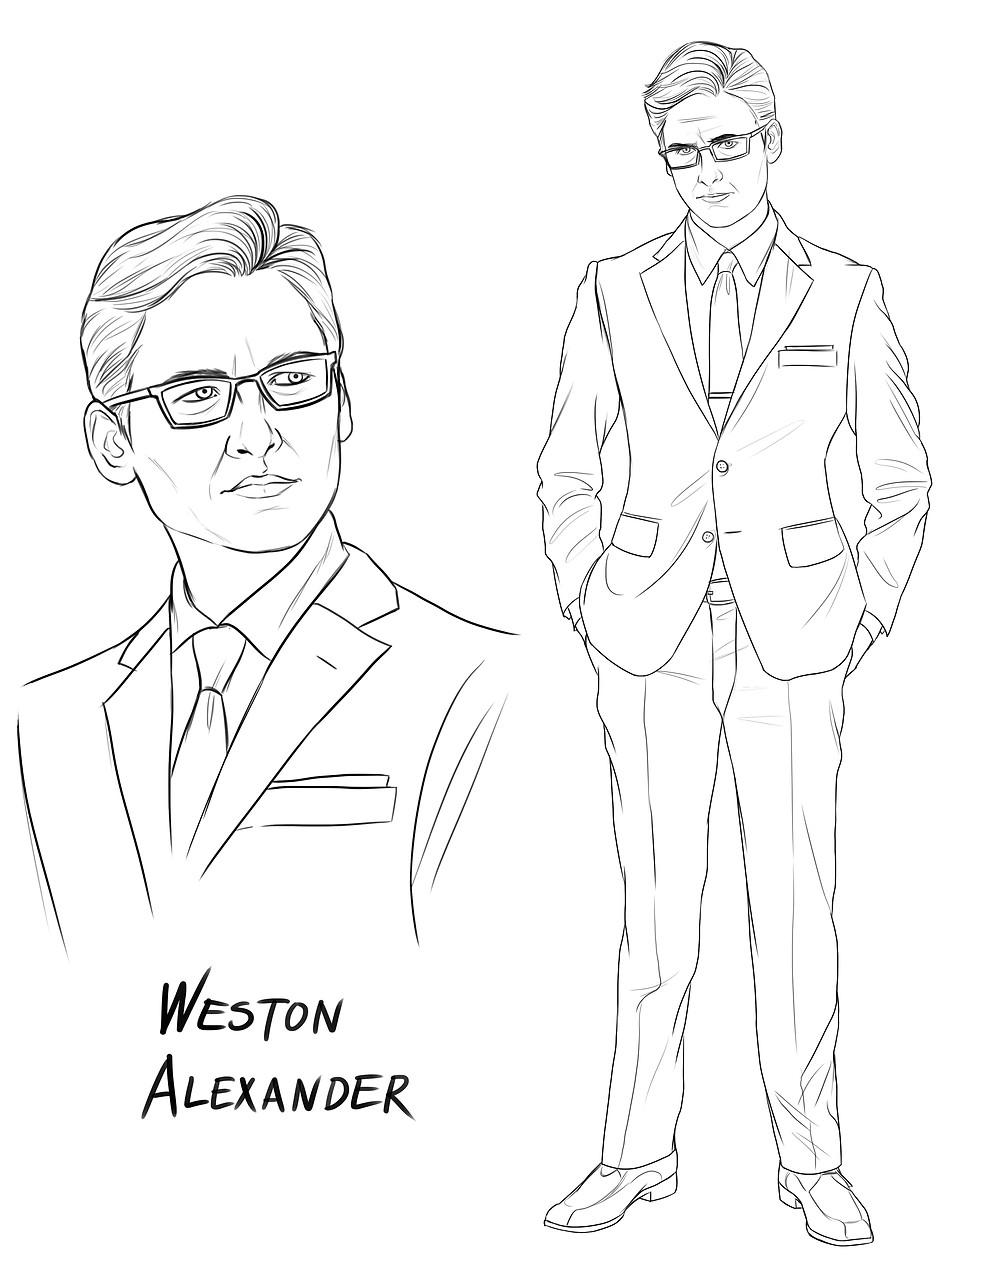 Weston Alexander